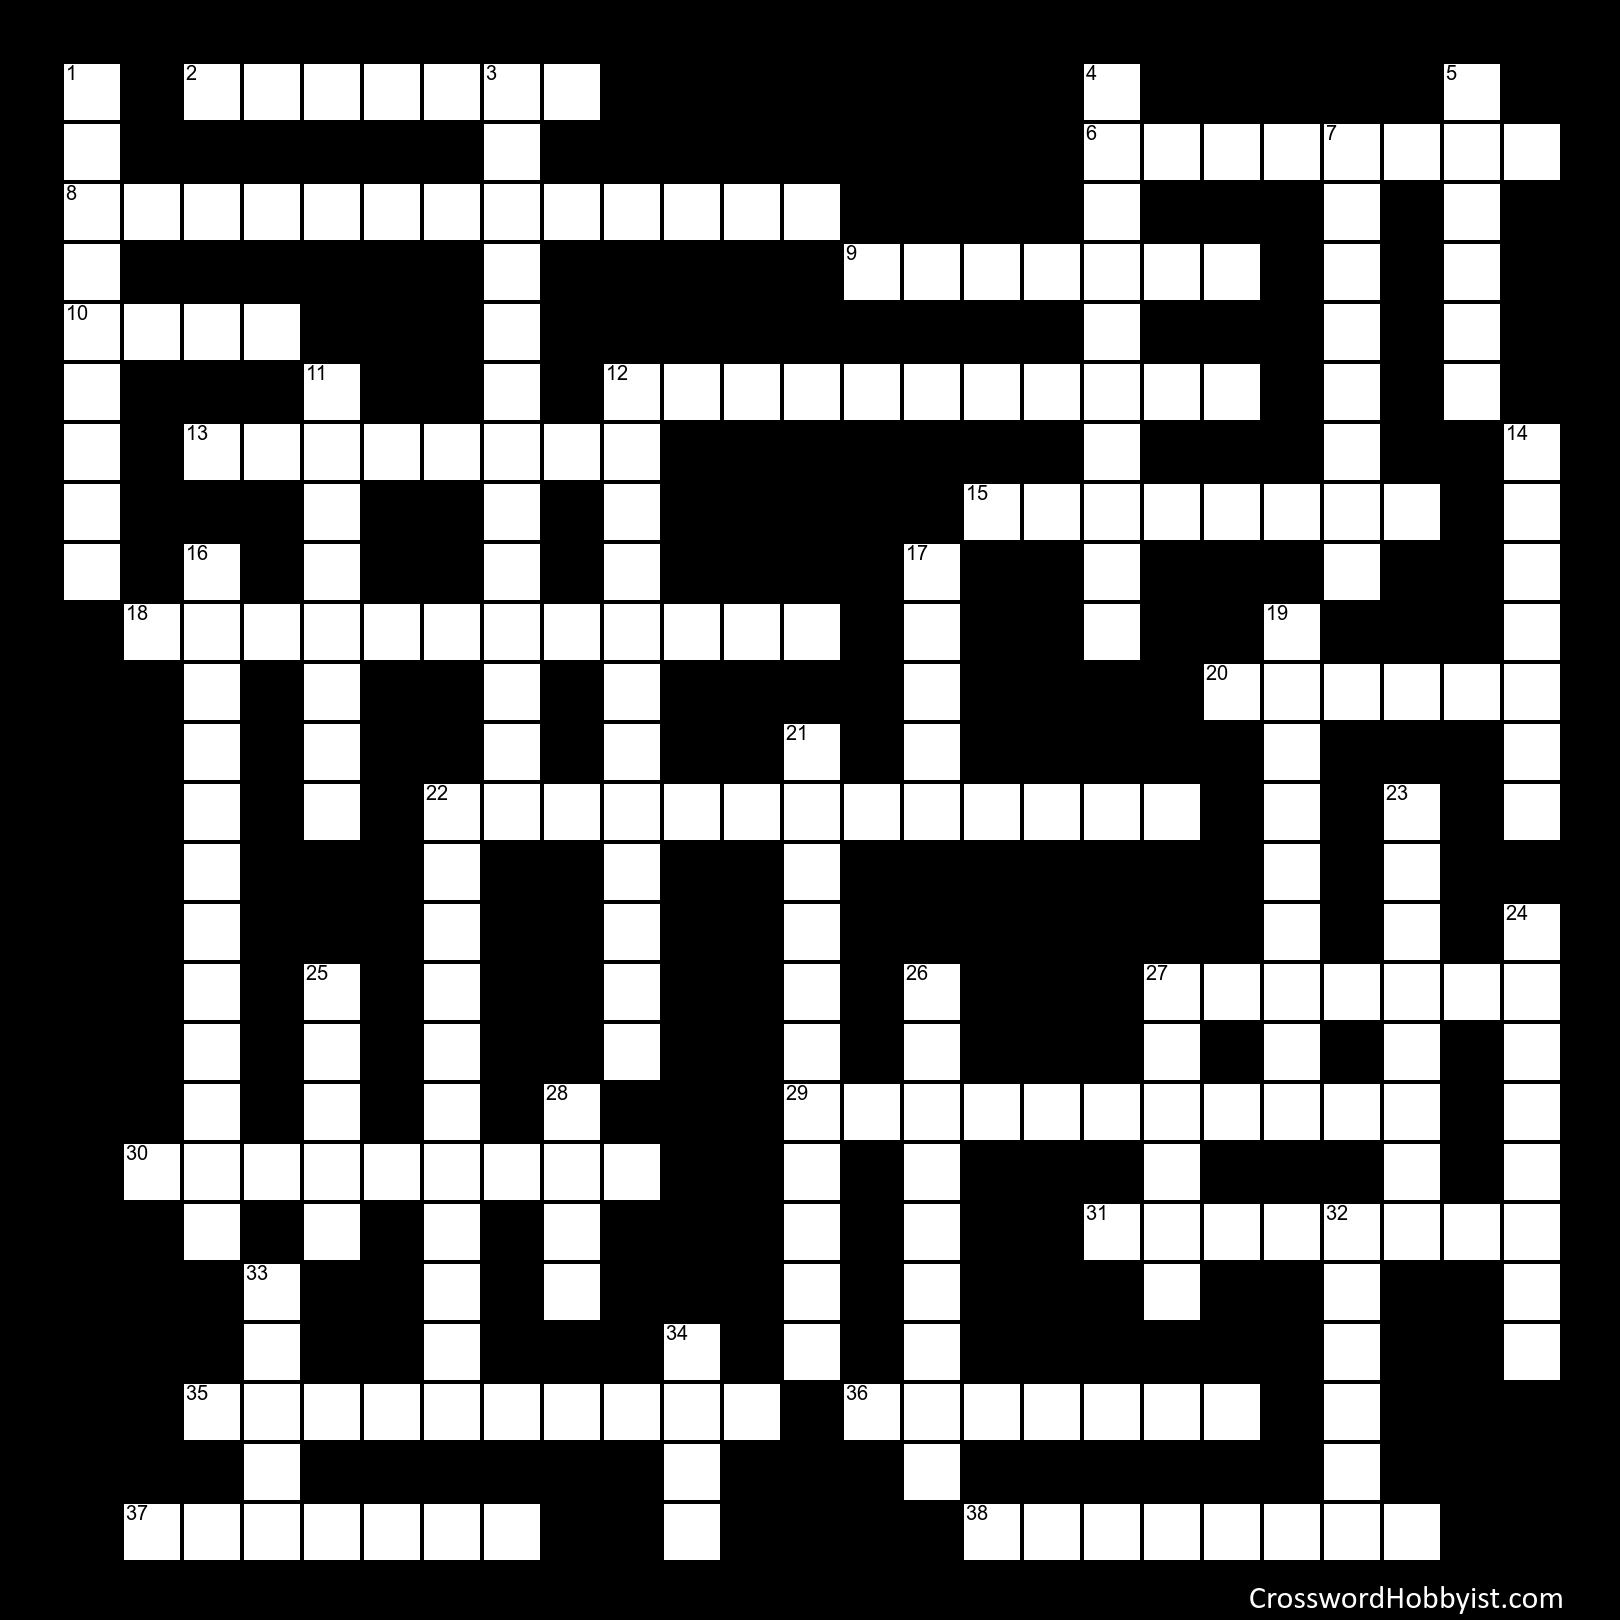 50 States - Crossword Puzzle